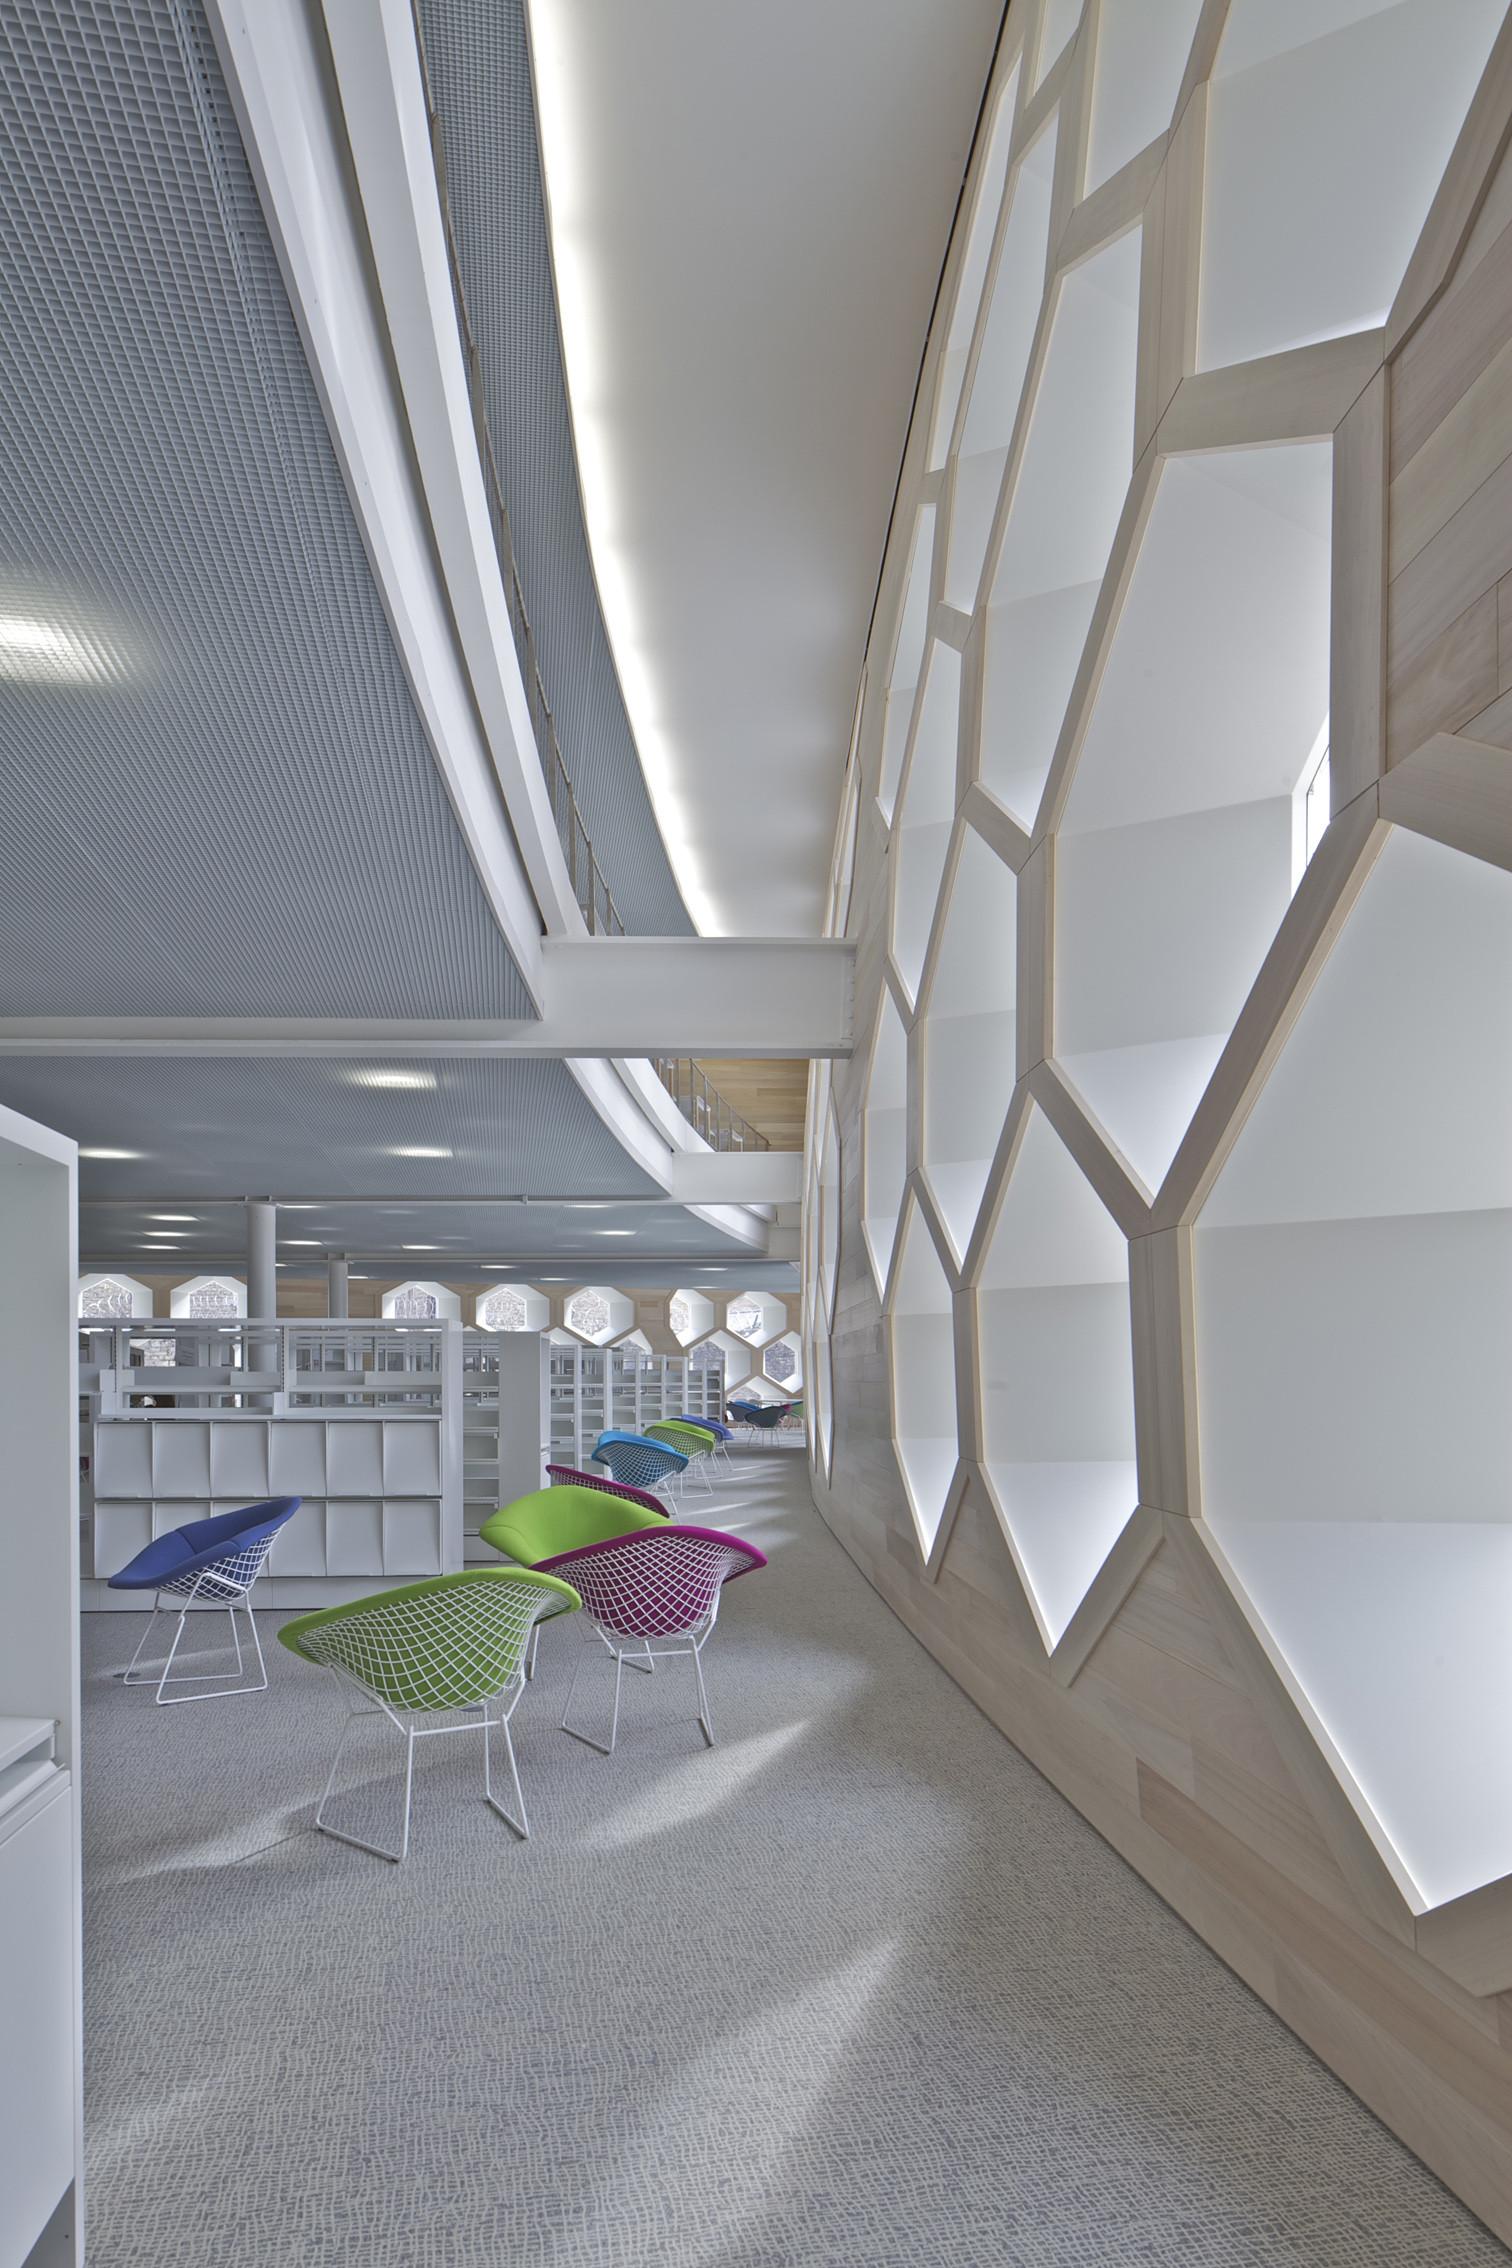 gallery of lons le saunier mediatheque du besset lyon architectes 13. Black Bedroom Furniture Sets. Home Design Ideas